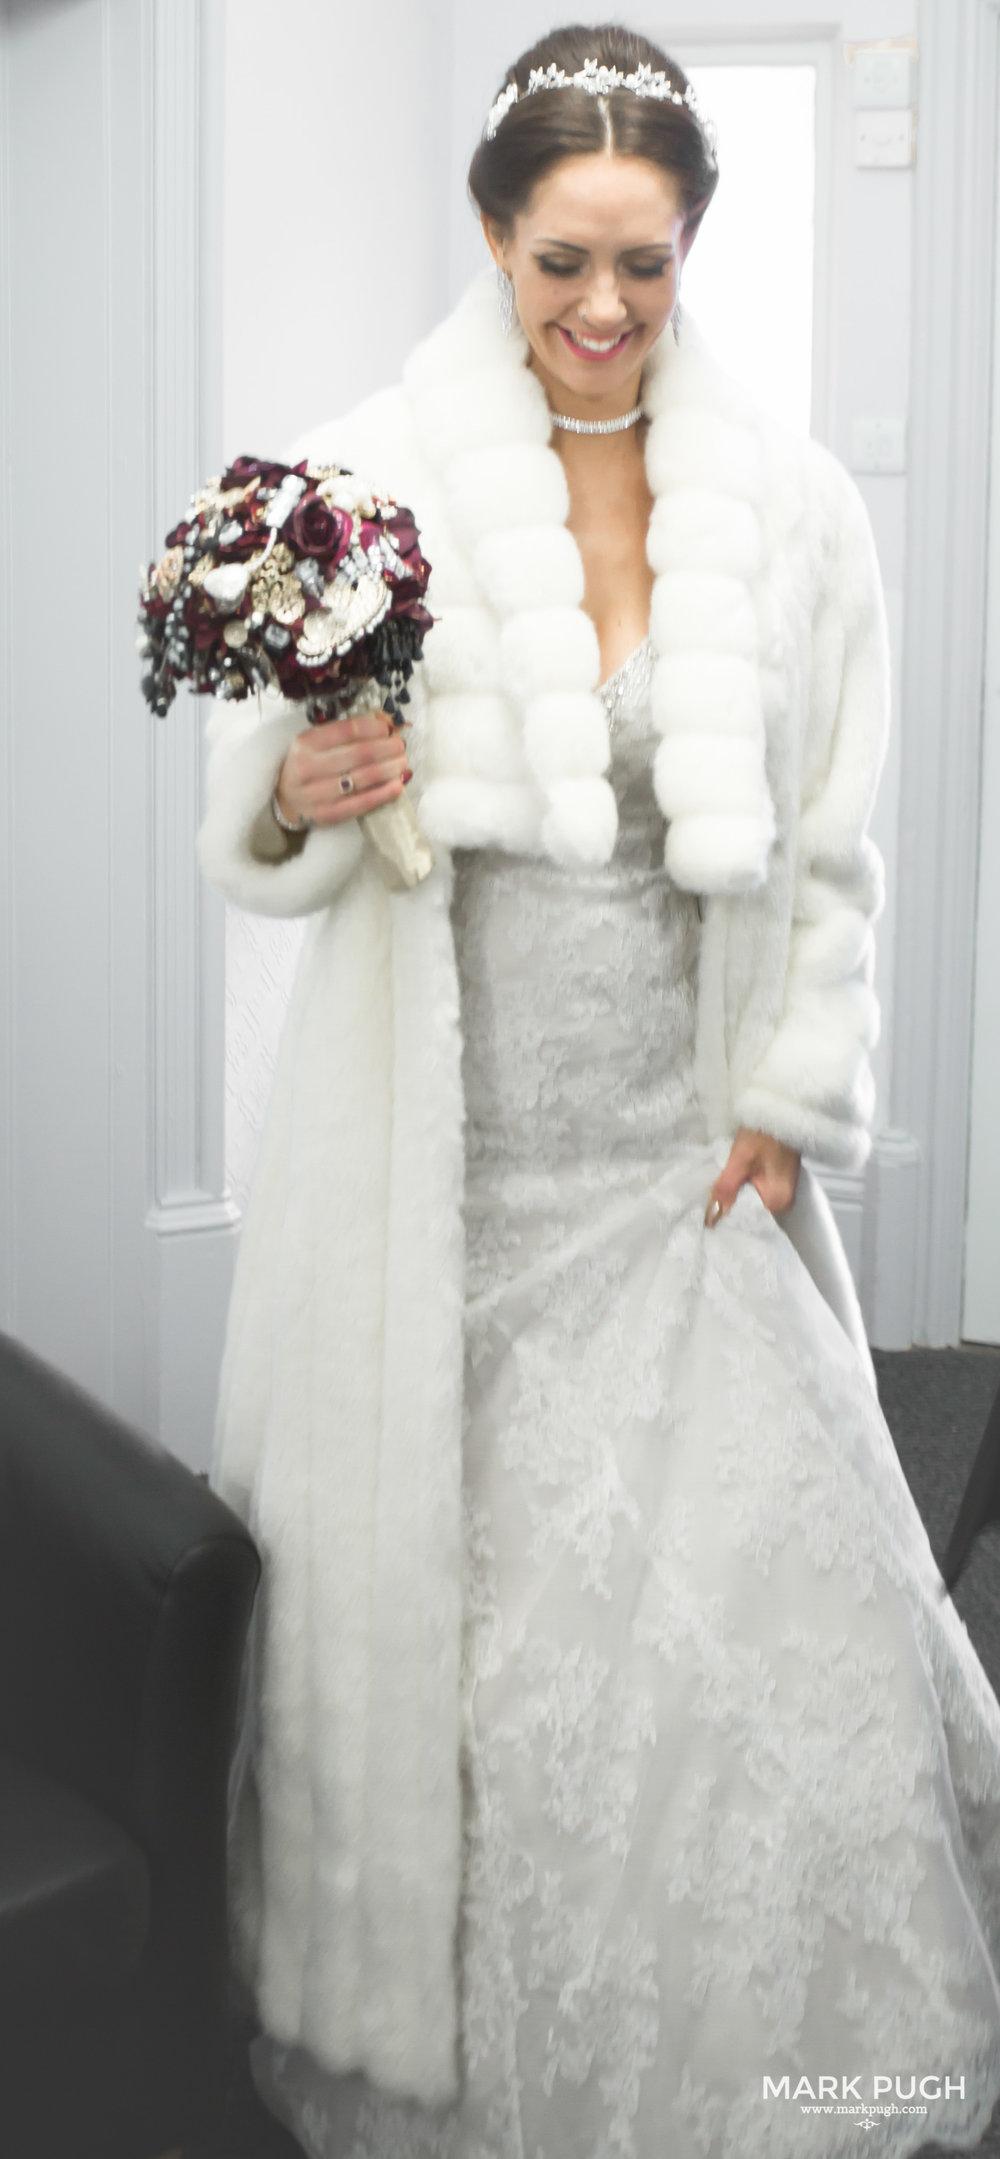 009 - Mary and Ashley - fineART wedding photography by www.markpugh.com Mark Pugh of www.mpmedia.co.uk_.JPG